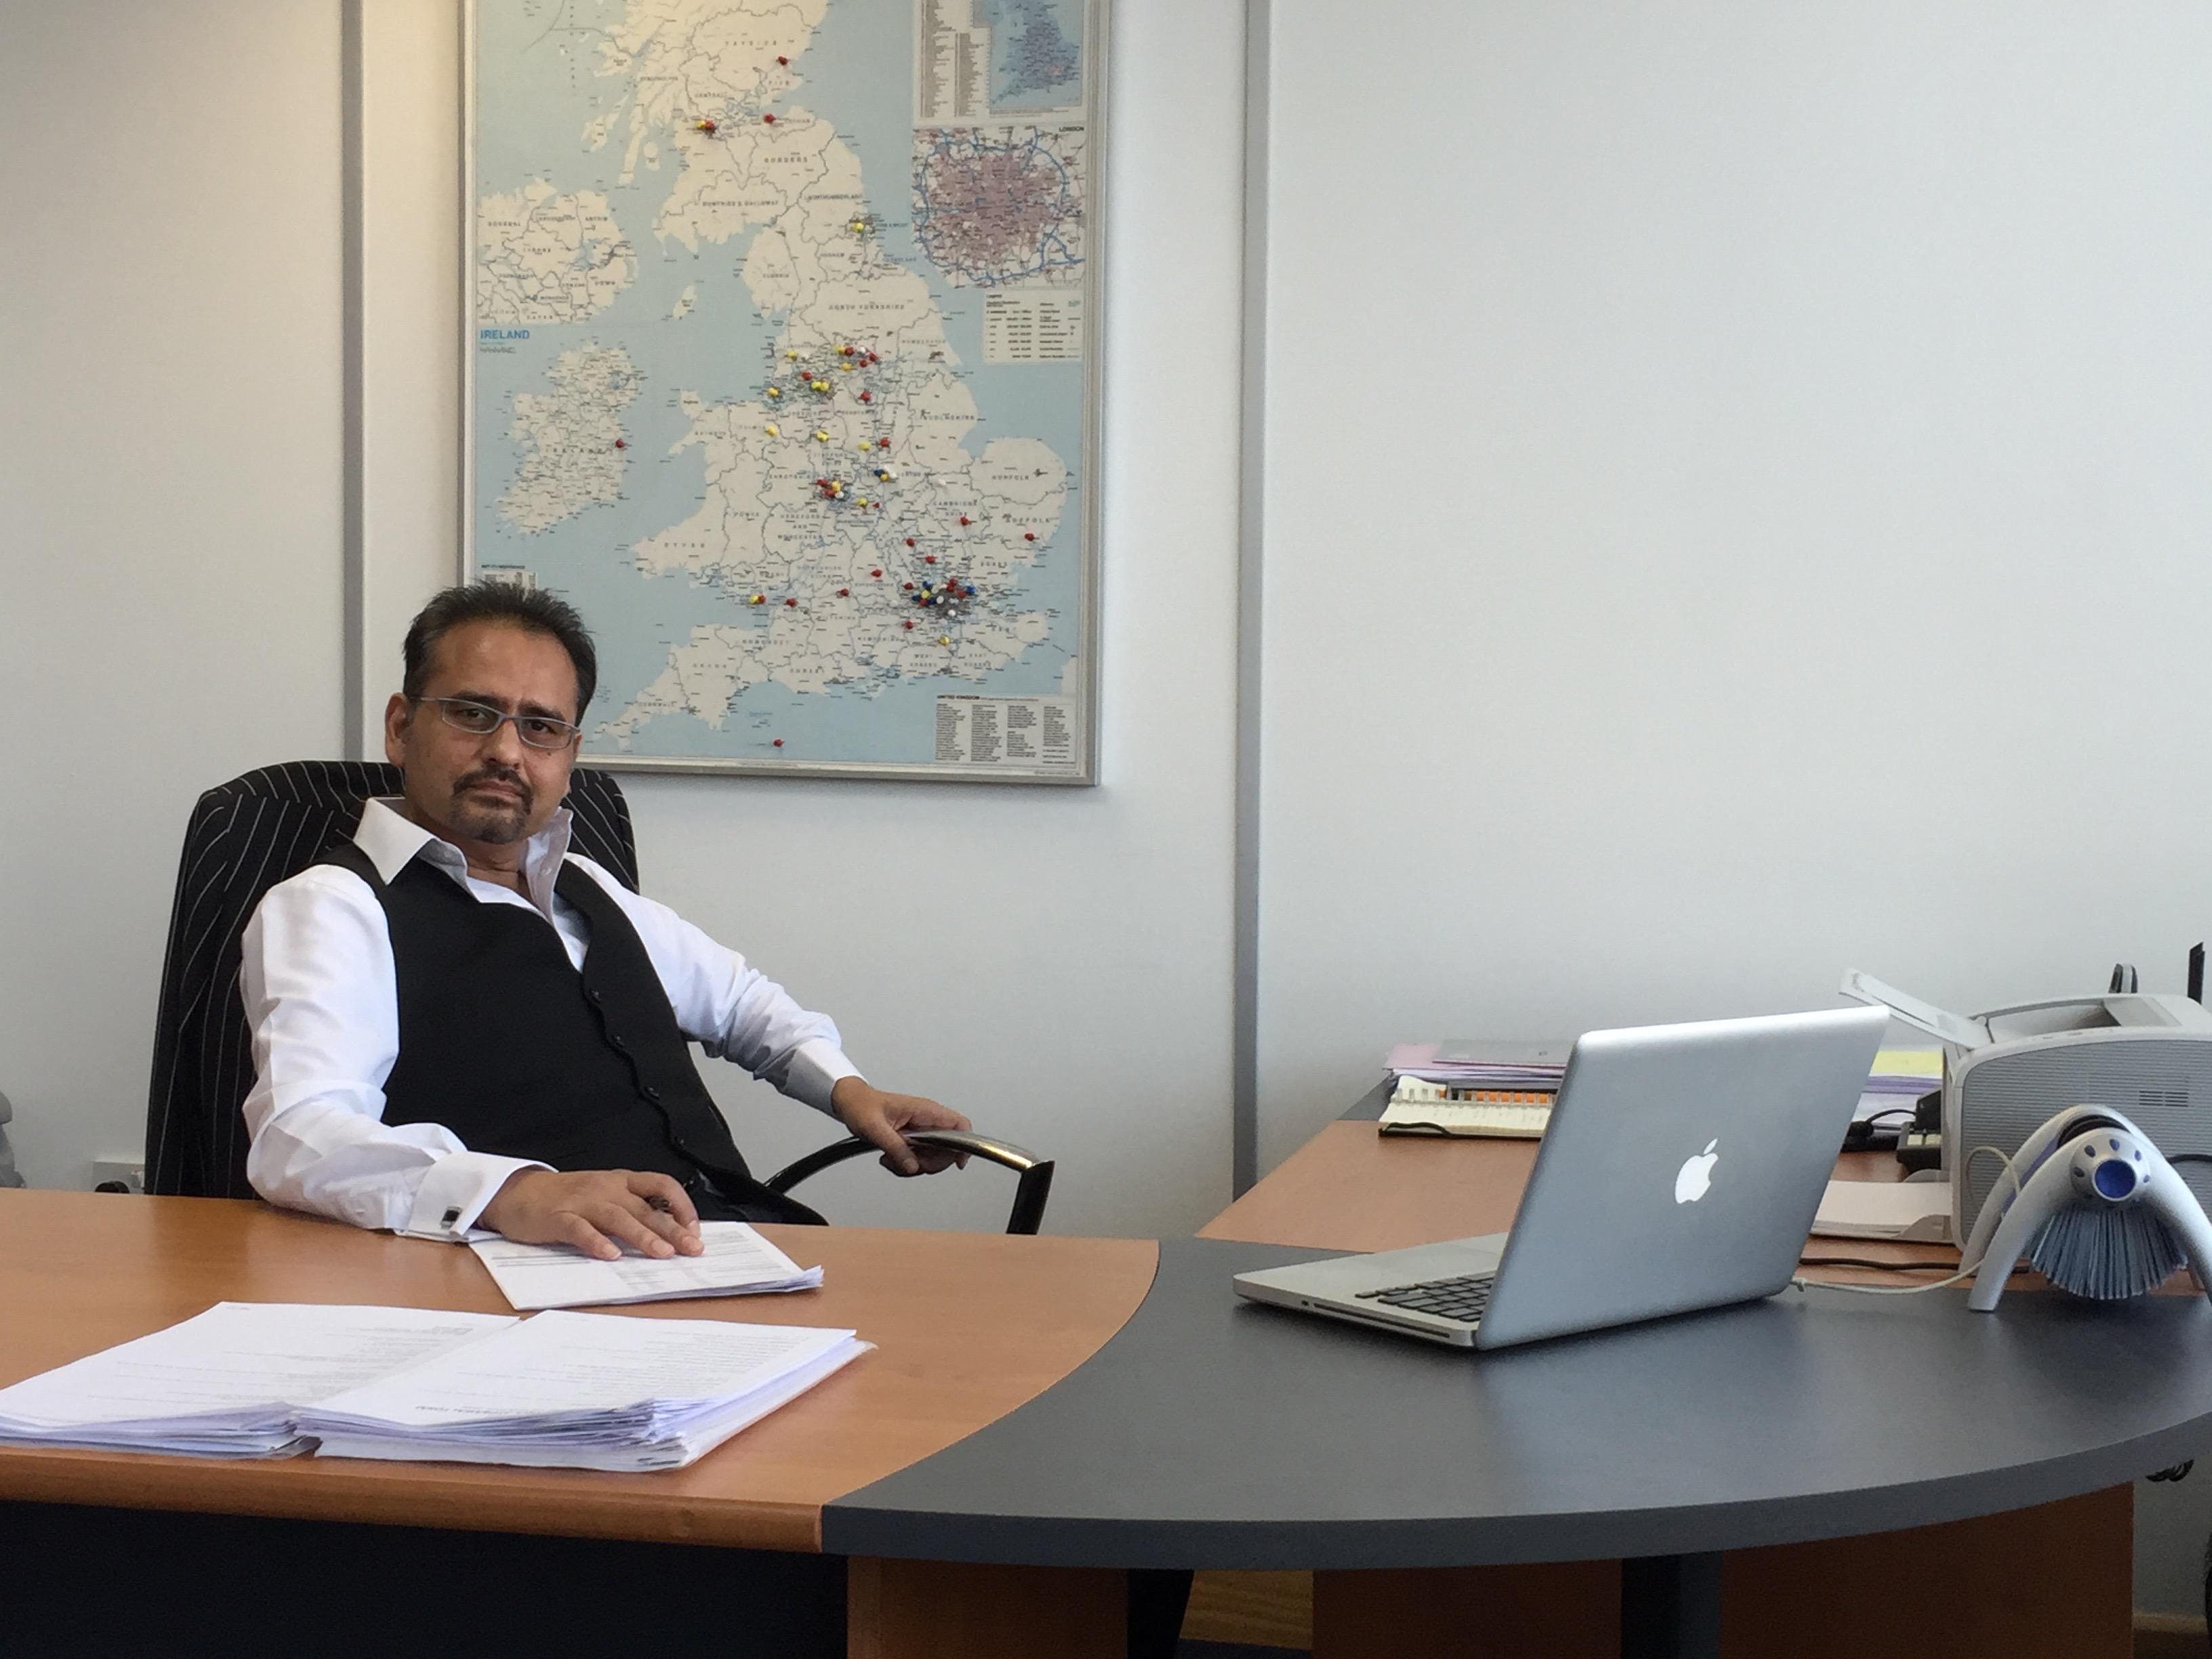 Avtar Panesar, Vice President, International Operations, Yash Raj Films